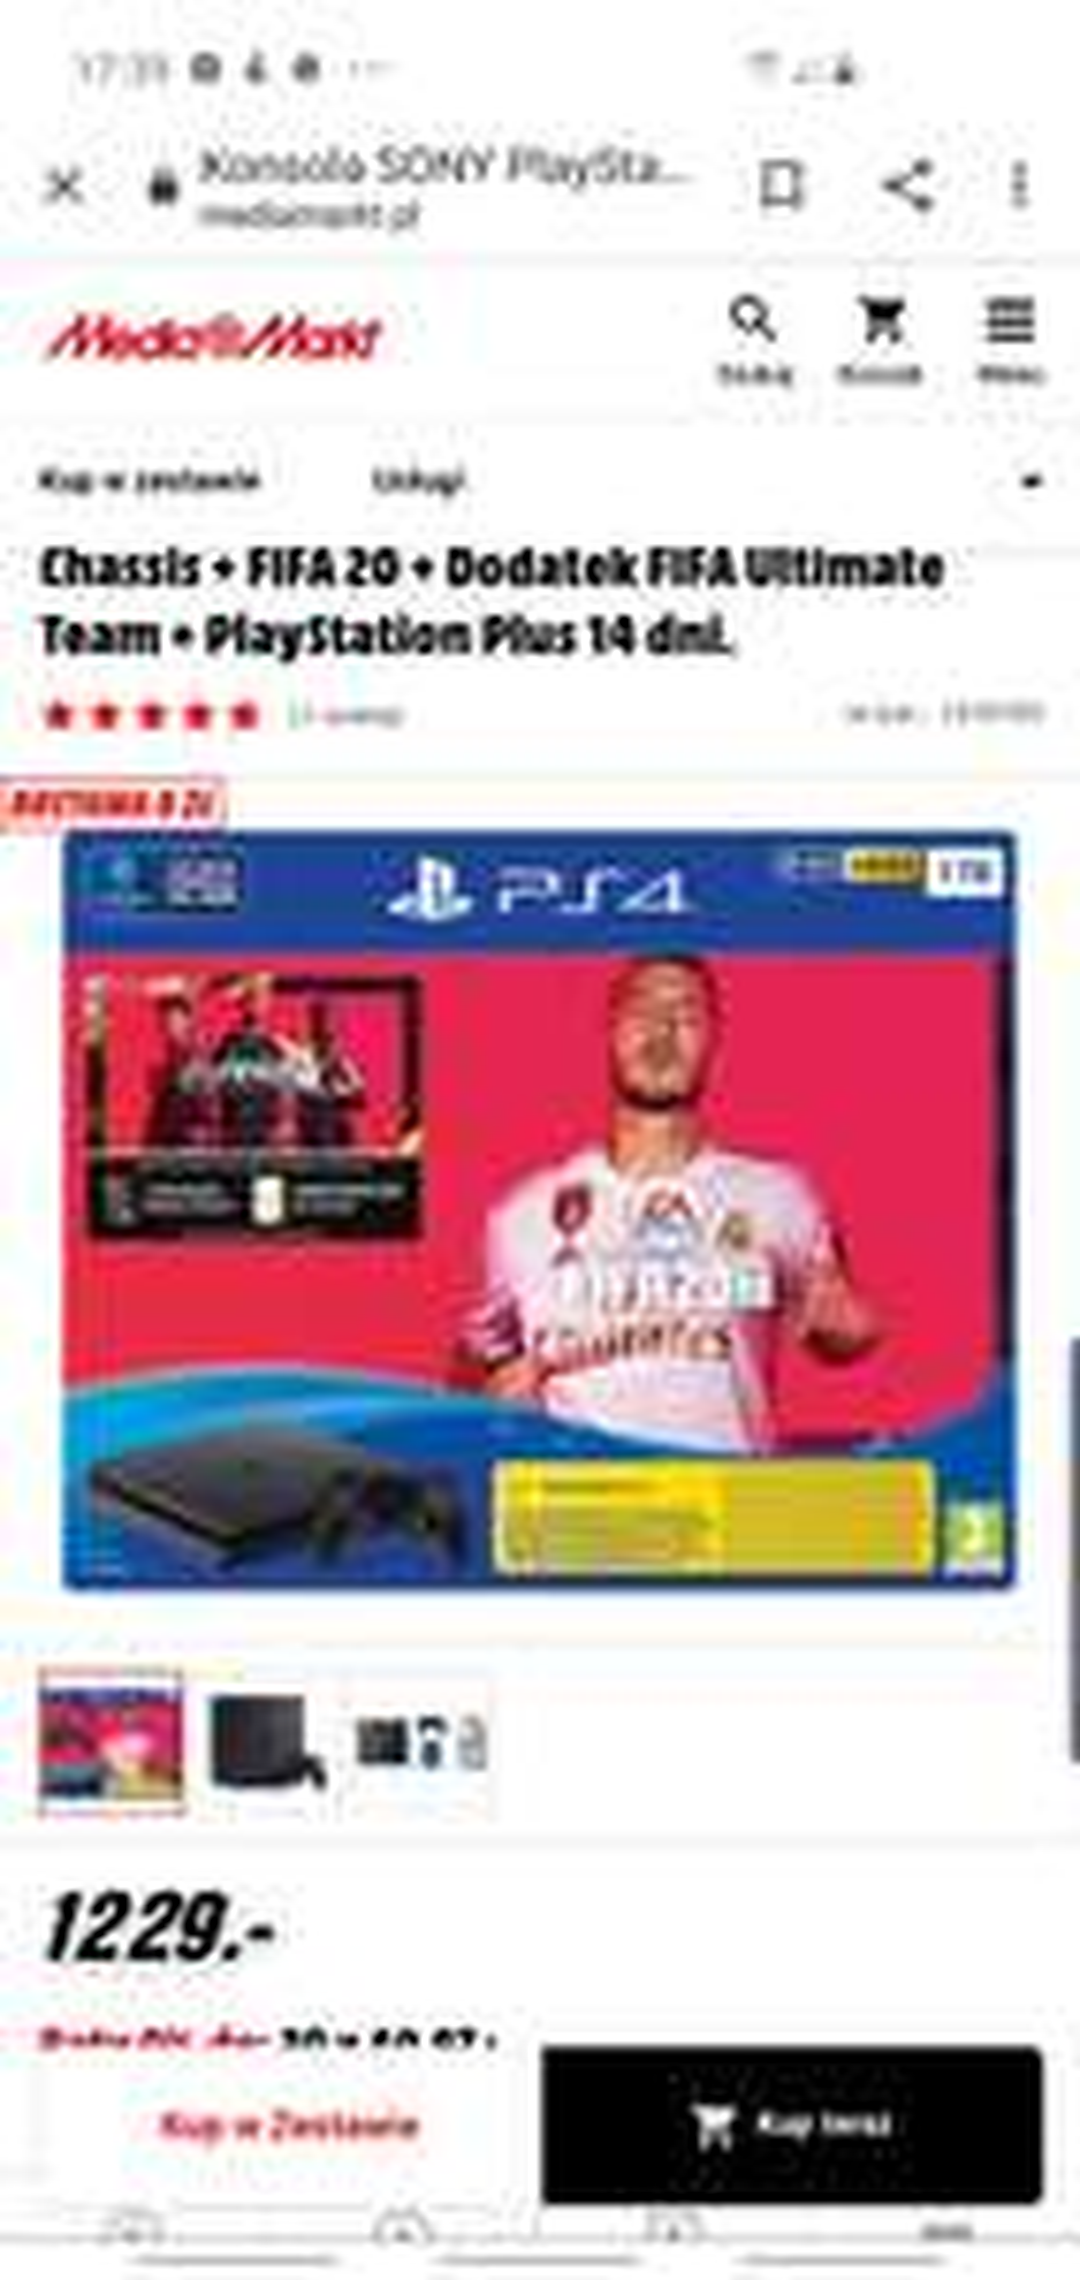 Konsola SONY PlayStation 4 Slim 1TB F Chassis + FIFA 20 + Dodatek FIFA Ultimate Team + PlayStation Plus 14 dni.